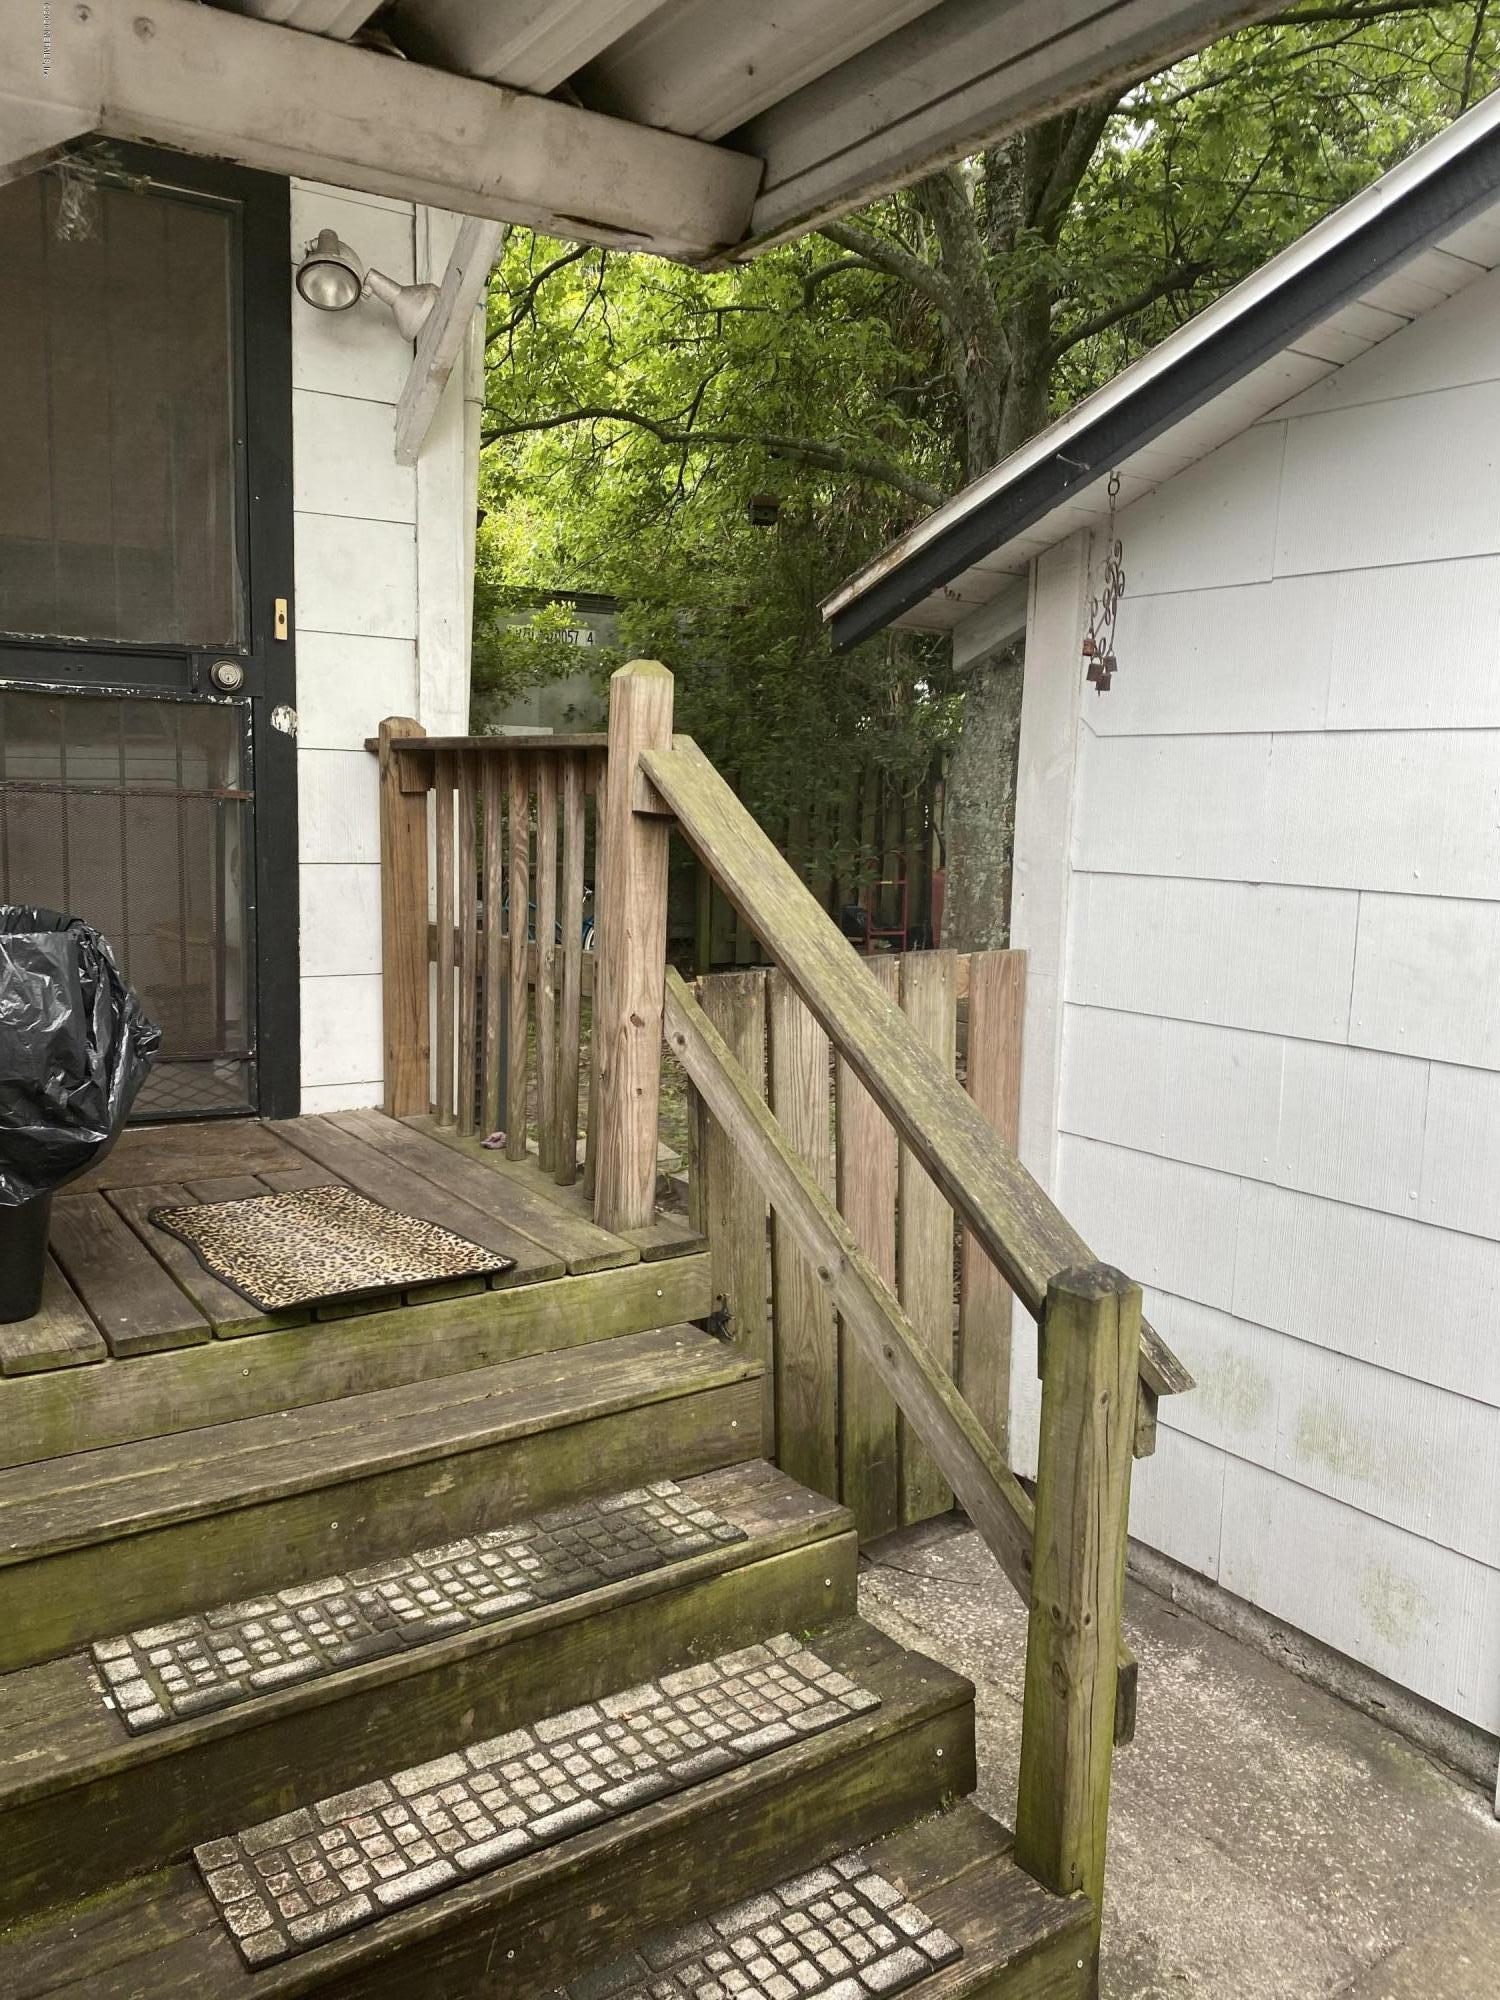 276 MCDUFF, JACKSONVILLE, FLORIDA 32254, 3 Bedrooms Bedrooms, ,1 BathroomBathrooms,Residential,For sale,MCDUFF,1048287